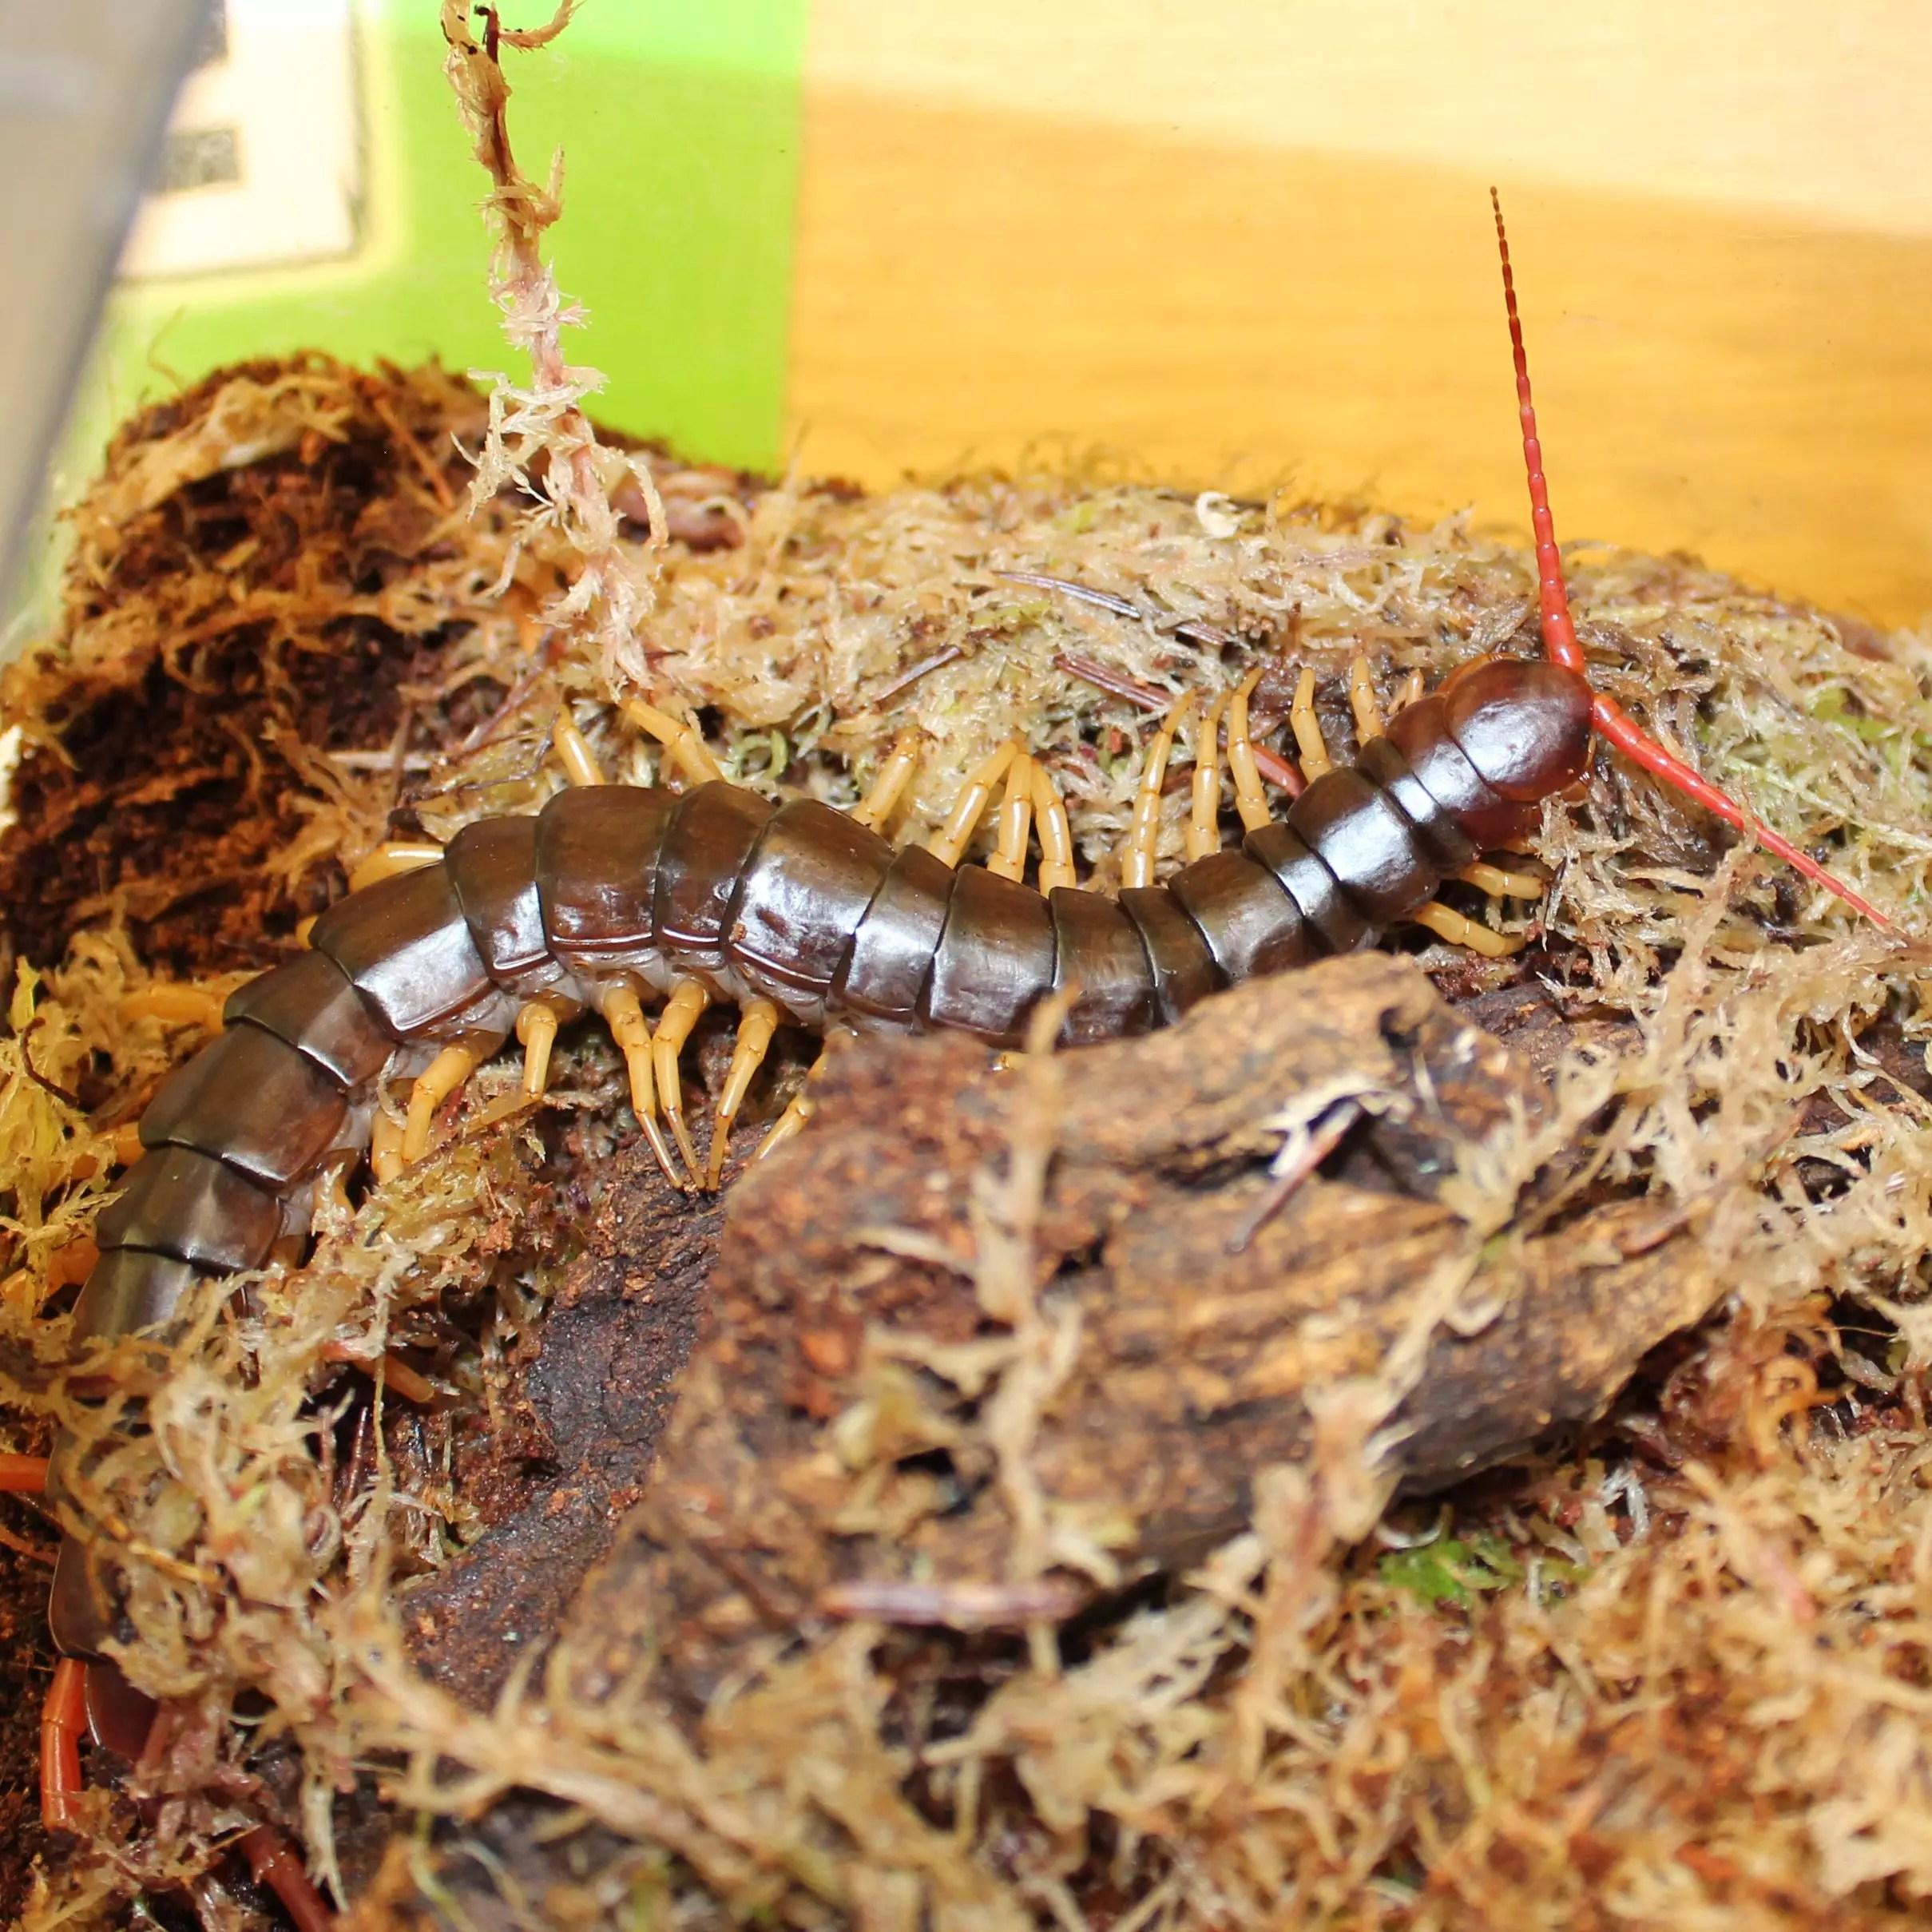 Vietnam Giant Centipede - Scolopendra dehanni